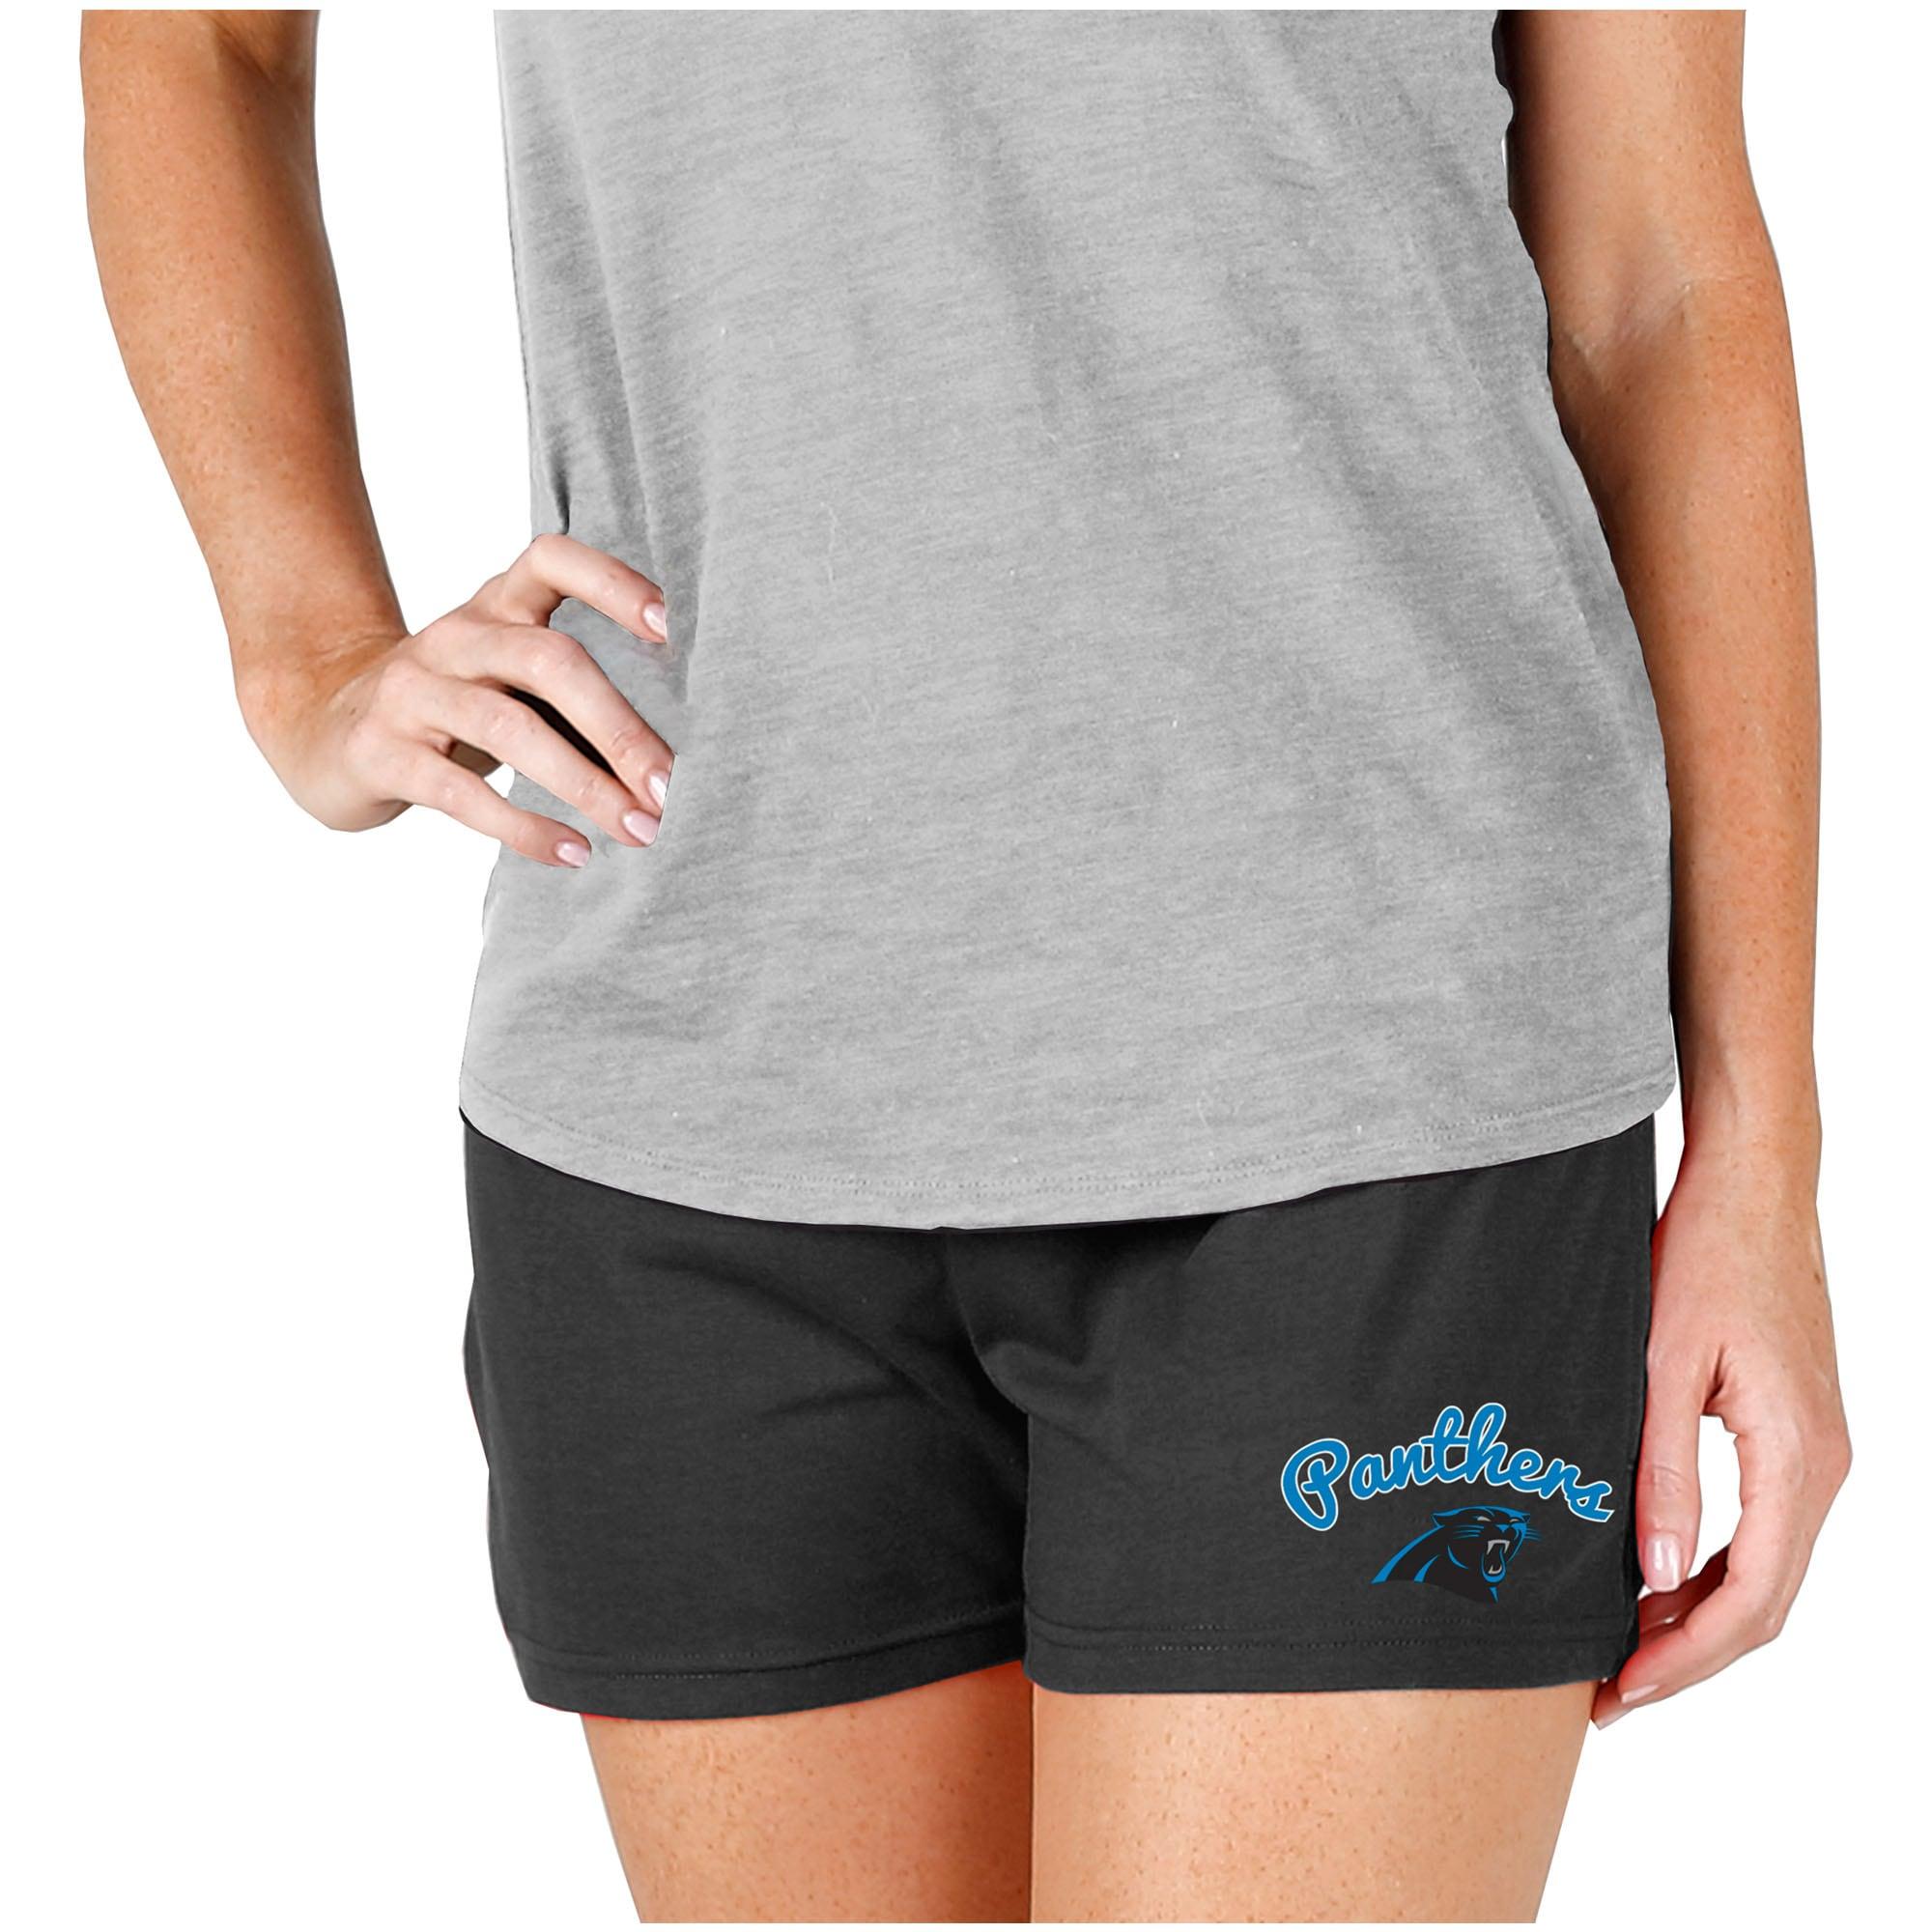 Carolina Panthers Concepts Sport Women's Knit Shorts - Charcoal